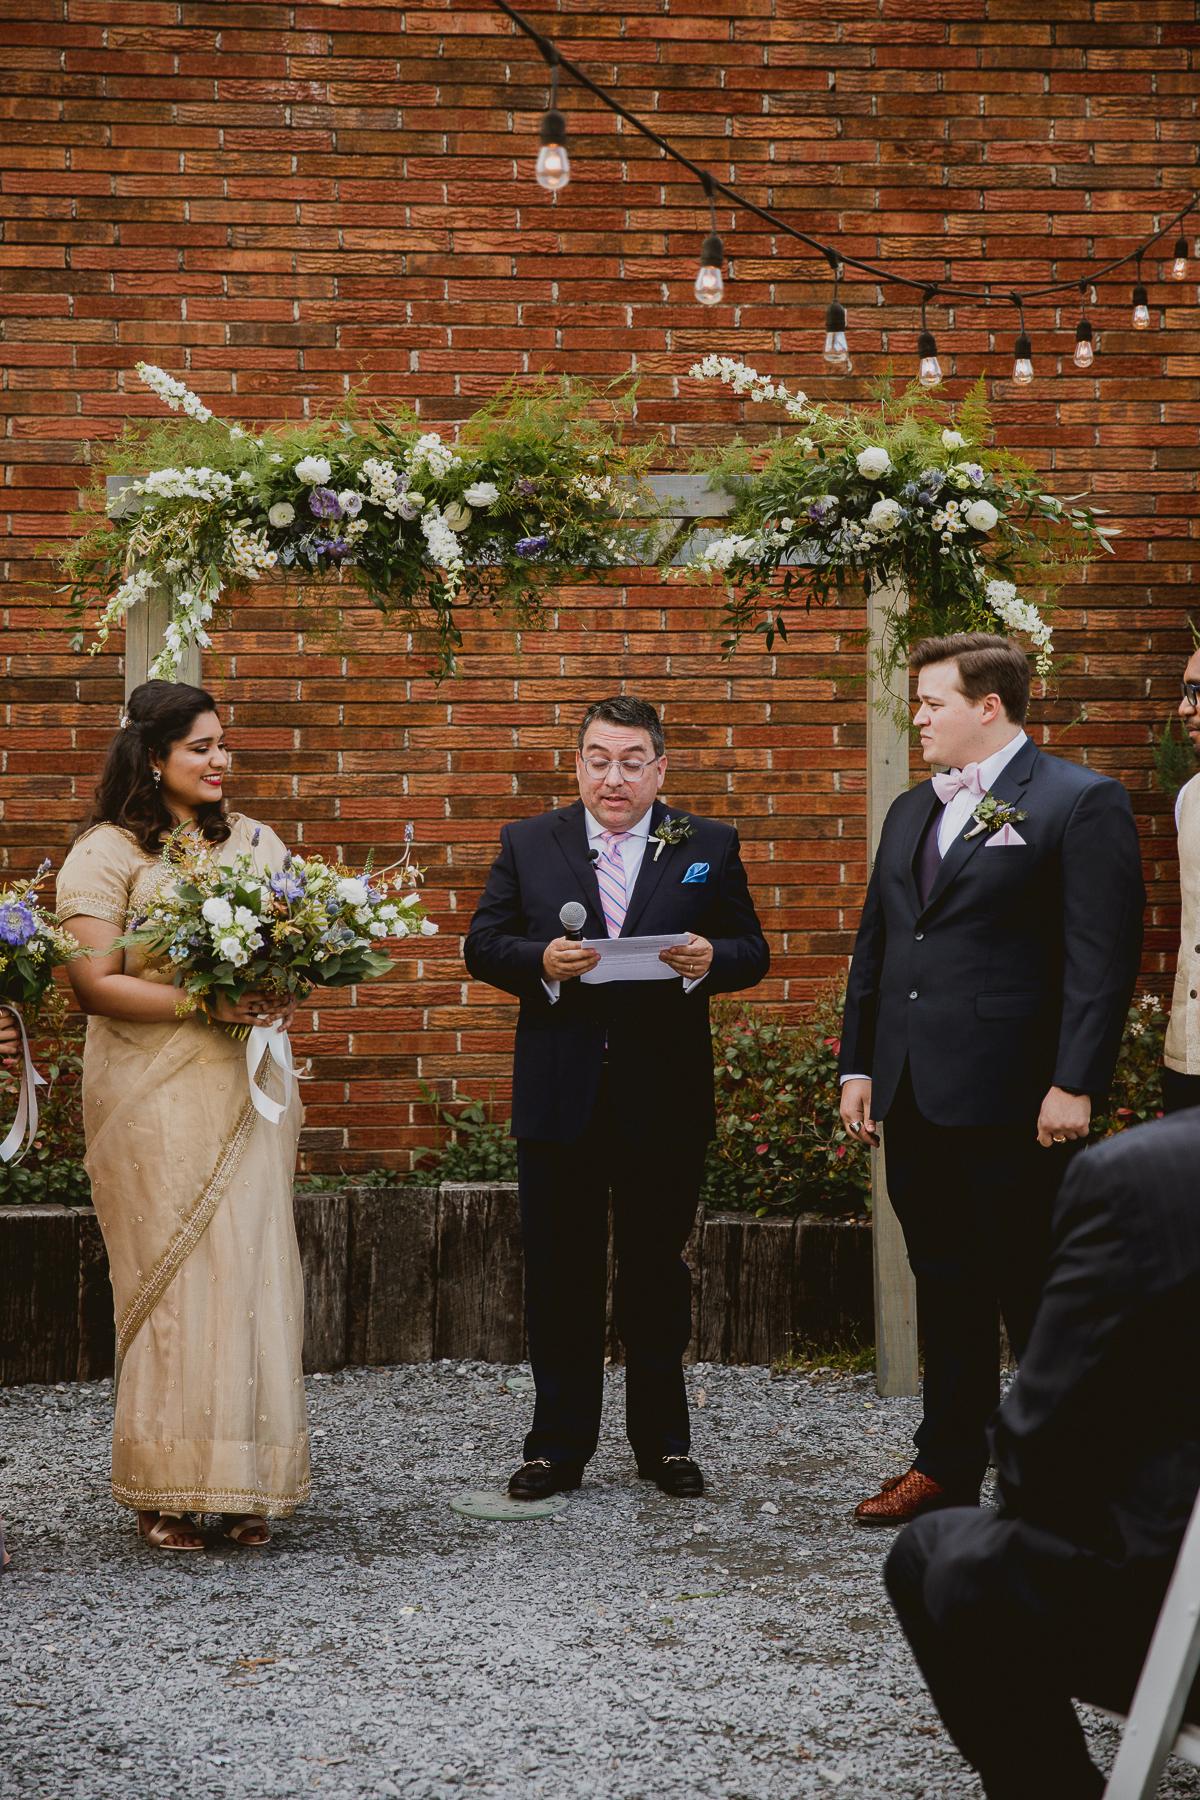 eventide-brewery-indian-american-fusion-kelley-raye-atlanta-los-angeles-wedding-photographer-58.jpg